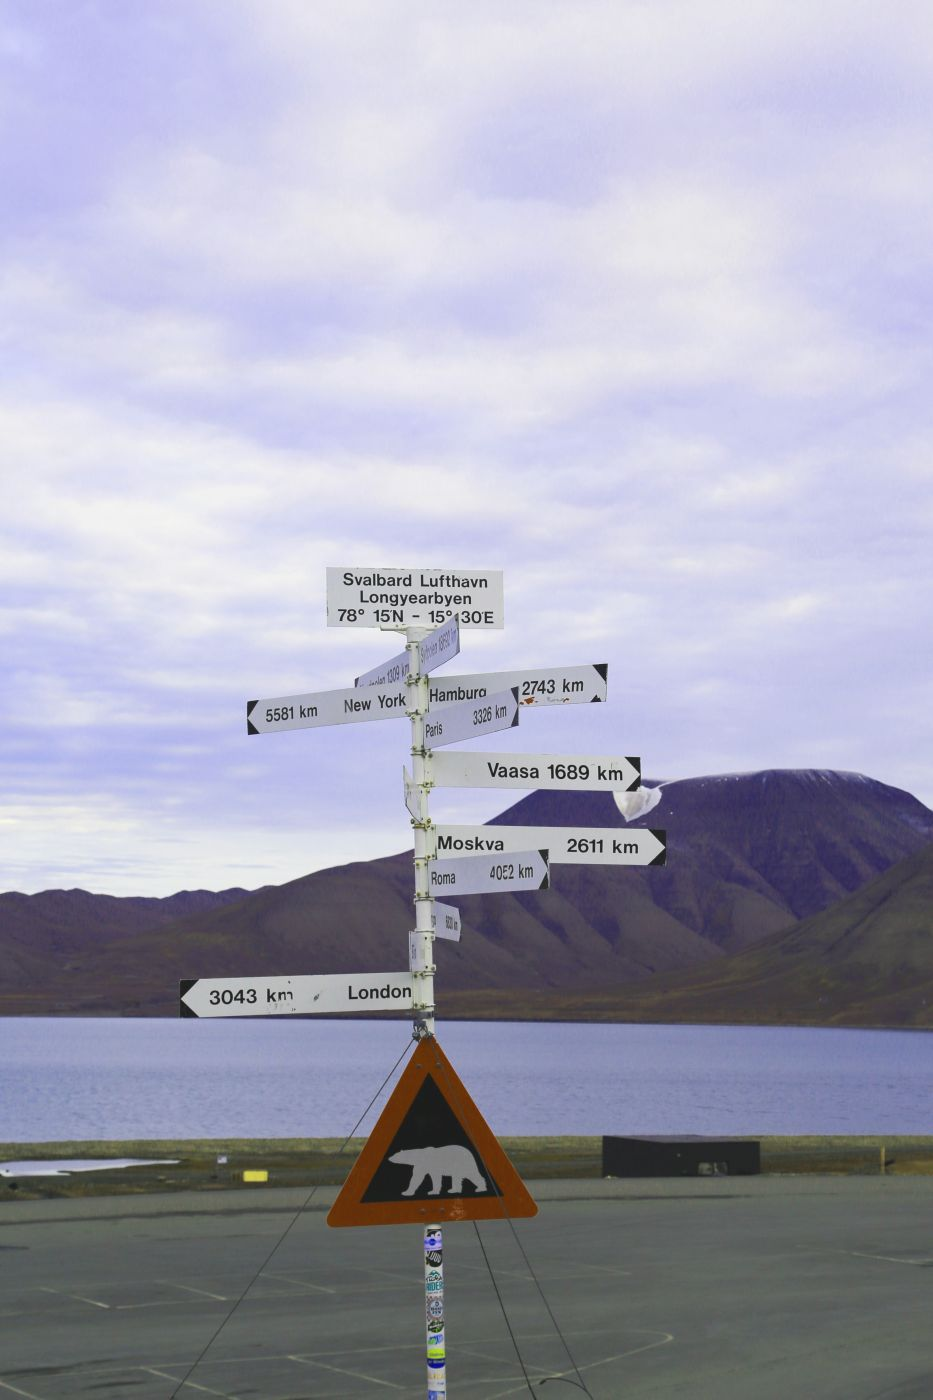 Spitsbergen, Svalbard & Jan Mayen Islands